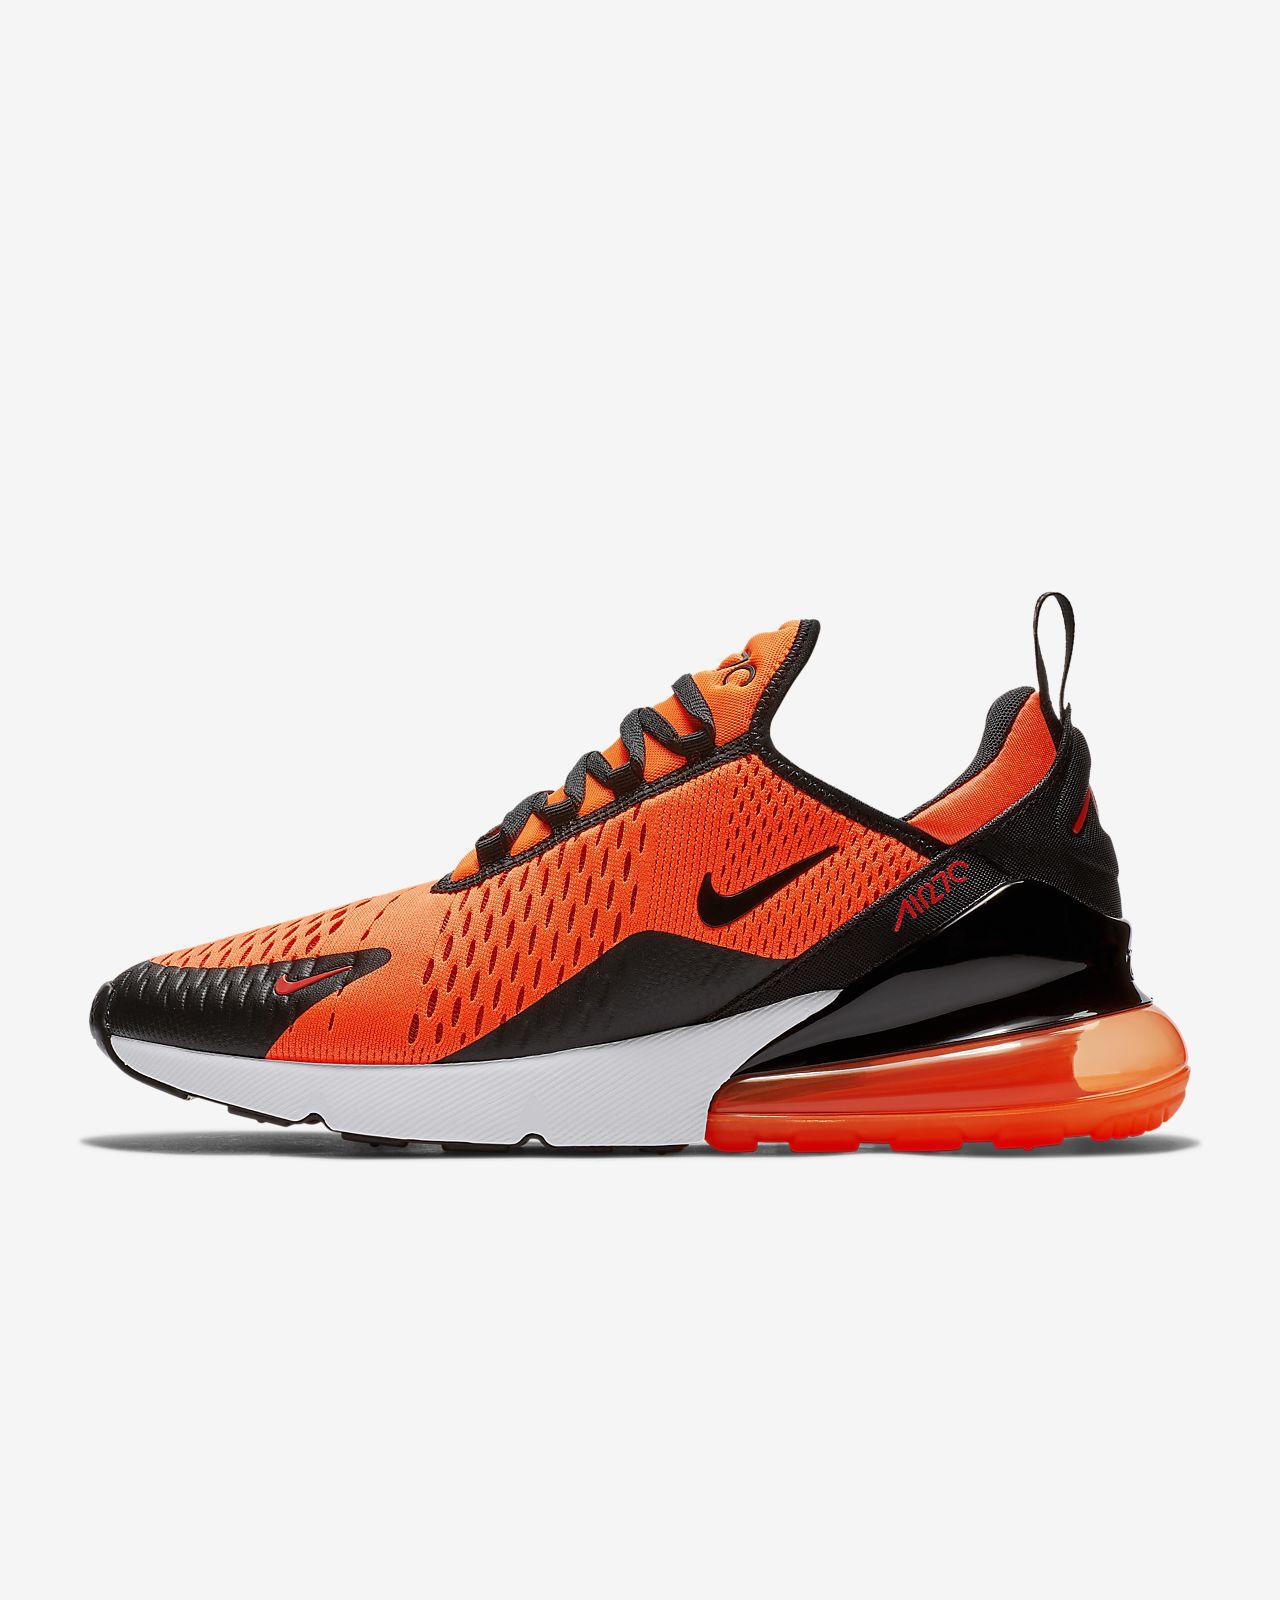 329e50b26c3e1 Nike Air Max 270 Zapatillas - Hombre. Nike.com ES